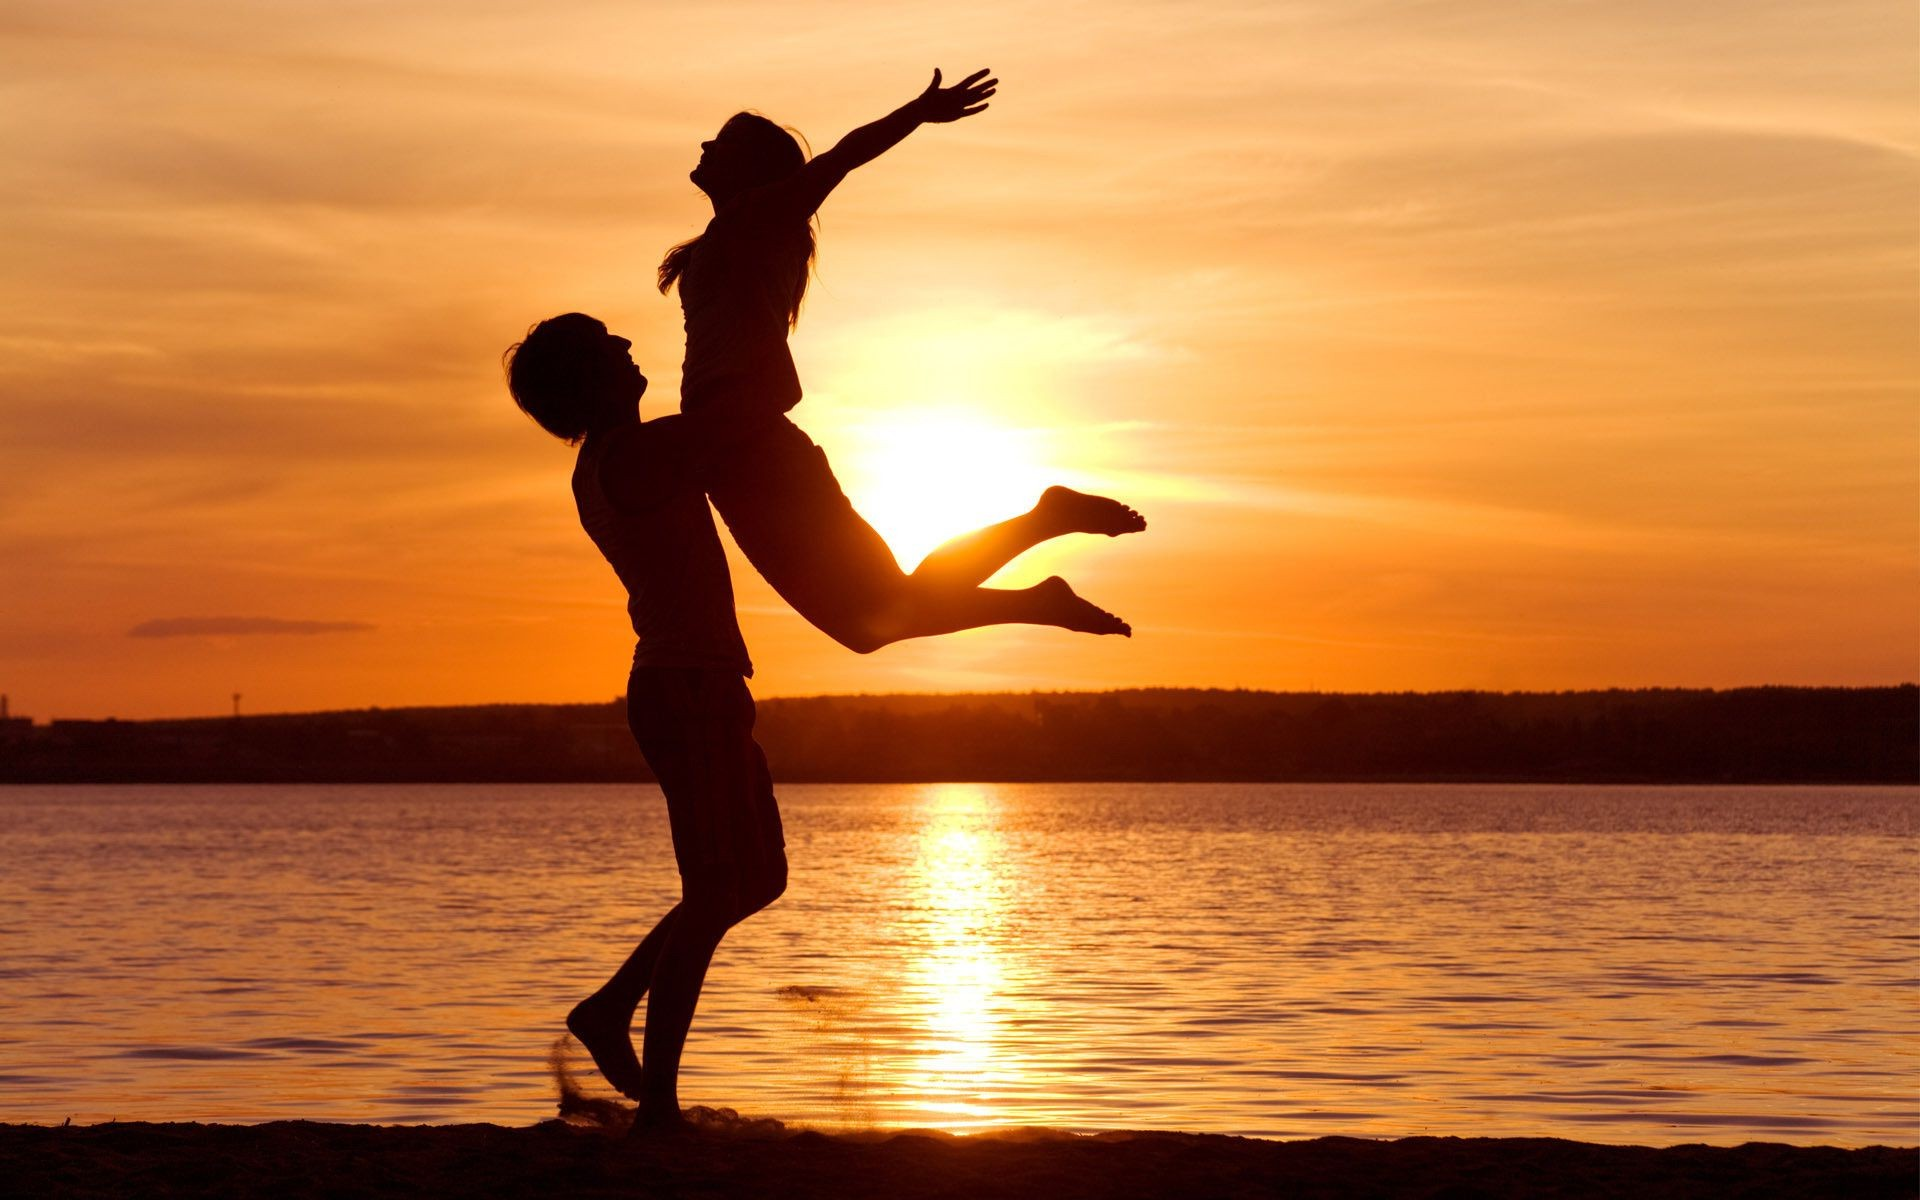 Love закат любовь свобода чувтсво берег